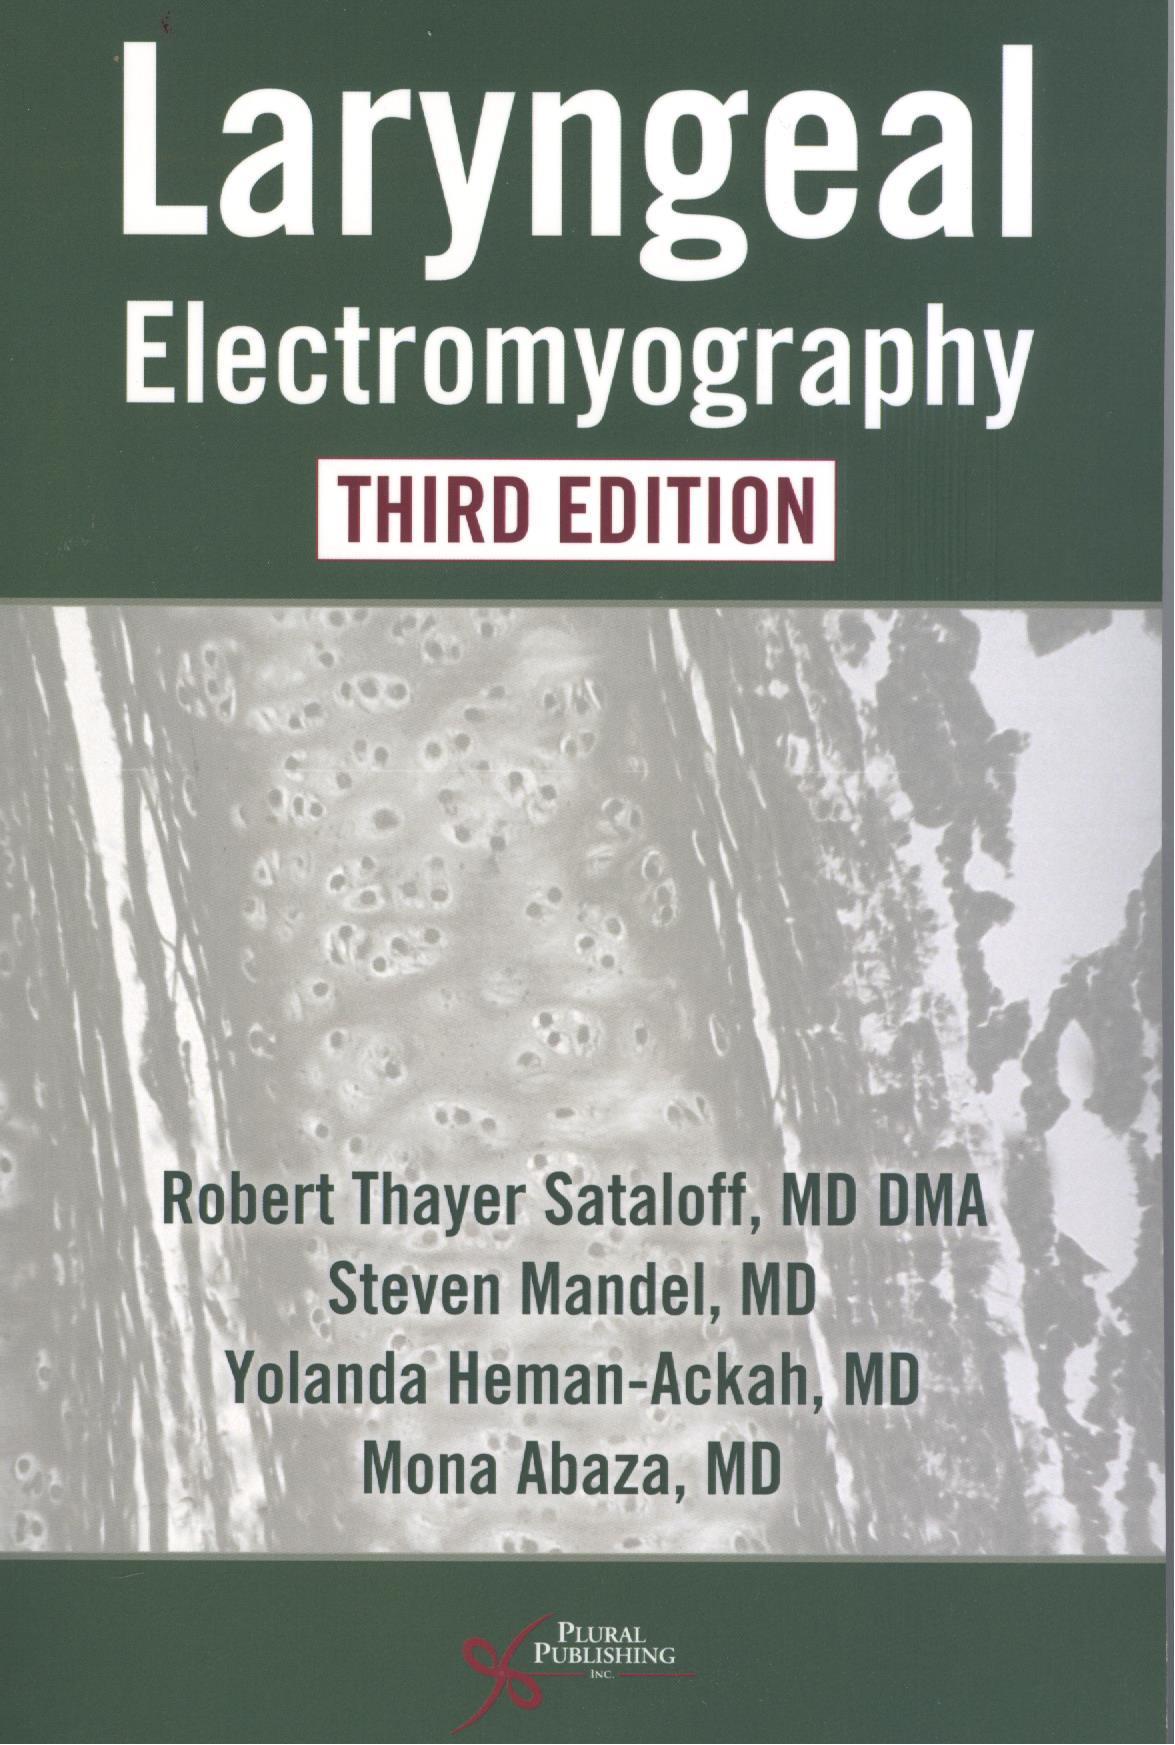 Laryngeal Electromyography, 3rd Edition